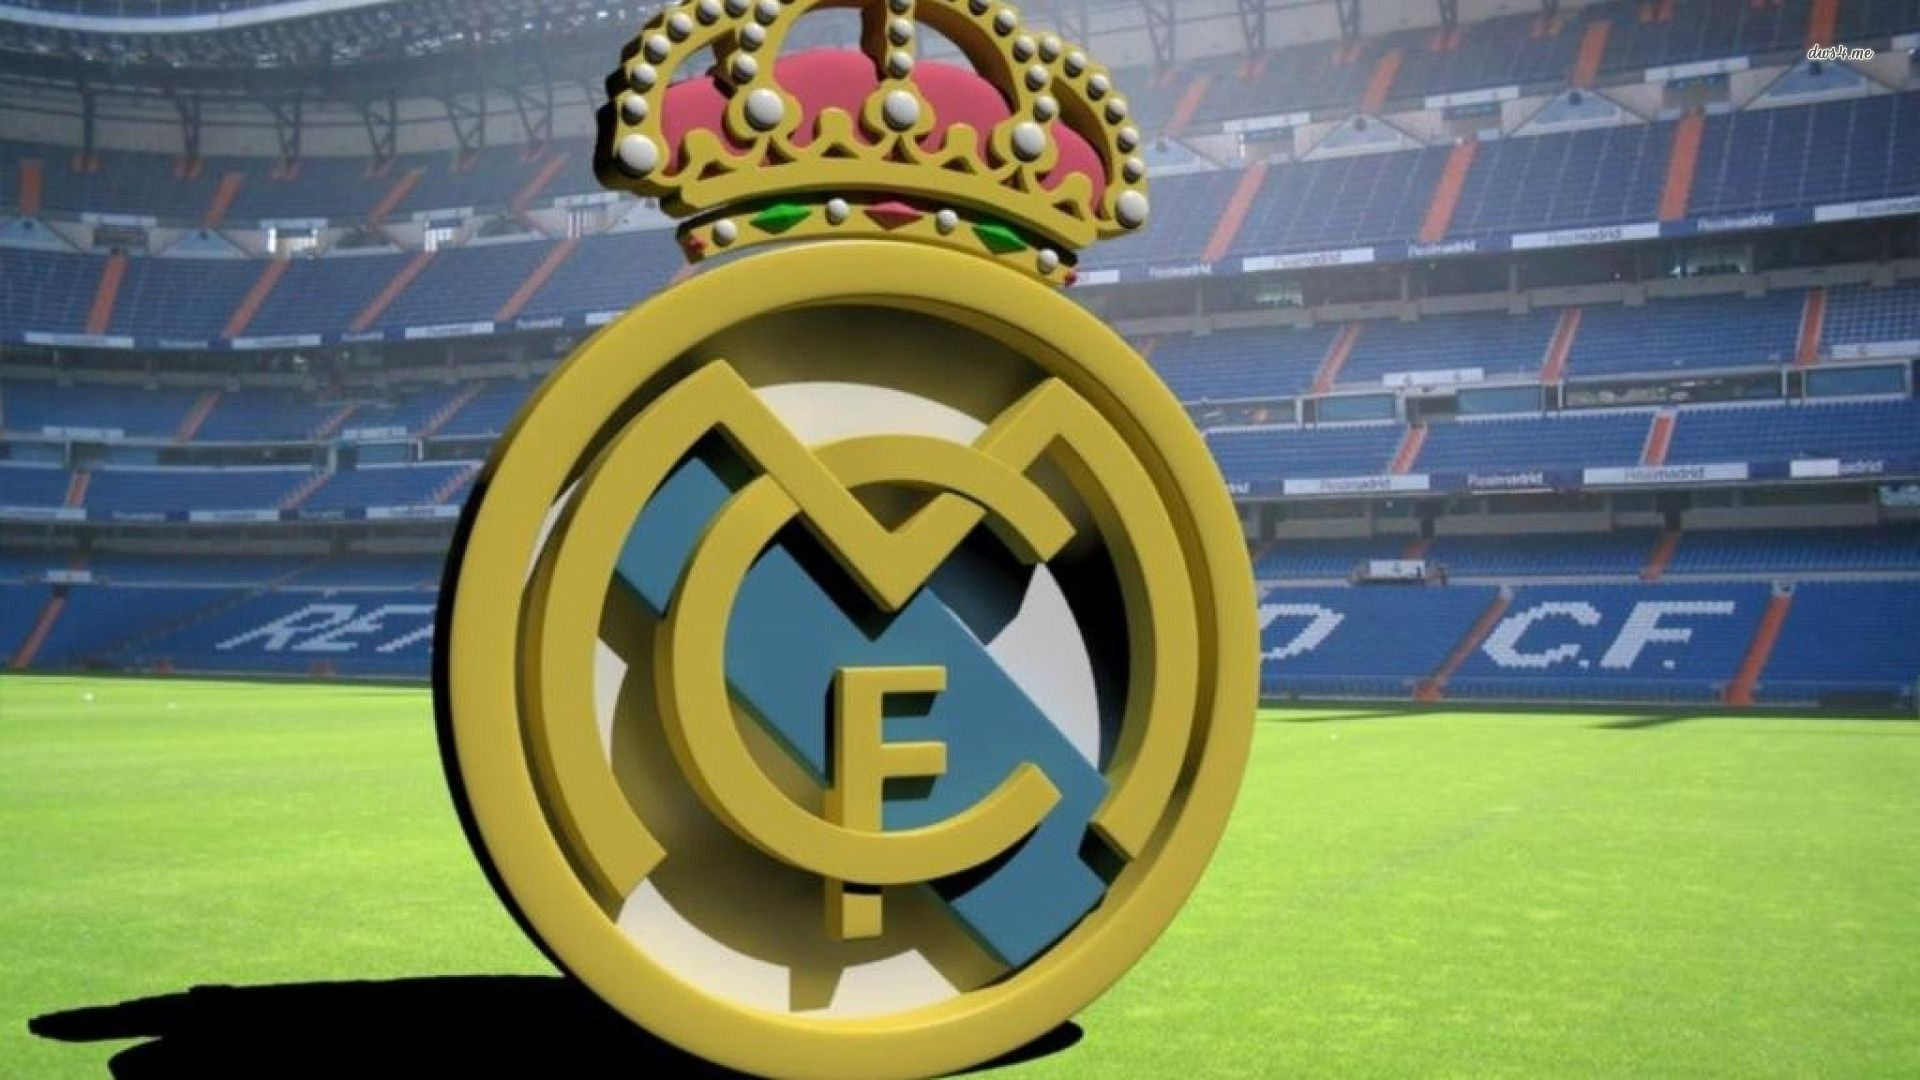 Real Madrid Logo Wallpaper Hd Pixelstalk Real Madrid Metal Logo Hd